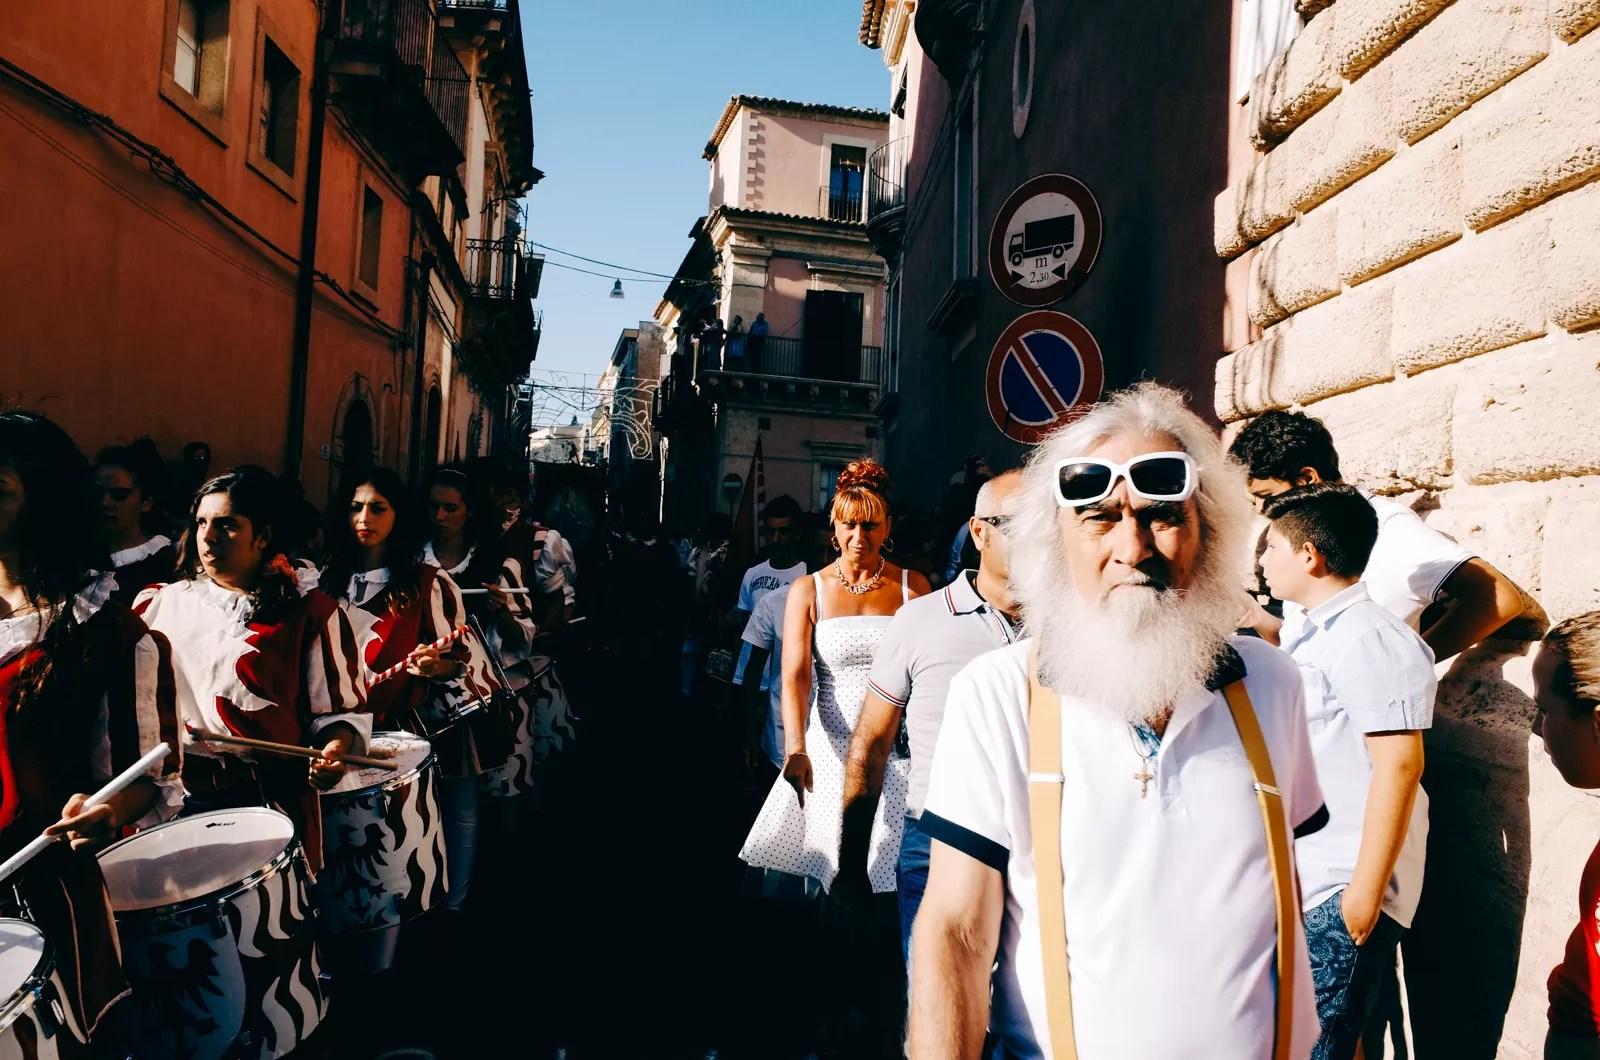 R0004781 - Siciliani in festa 18 Agosto 2015  (Parte 1) Street Photography Session - fotostreet.it